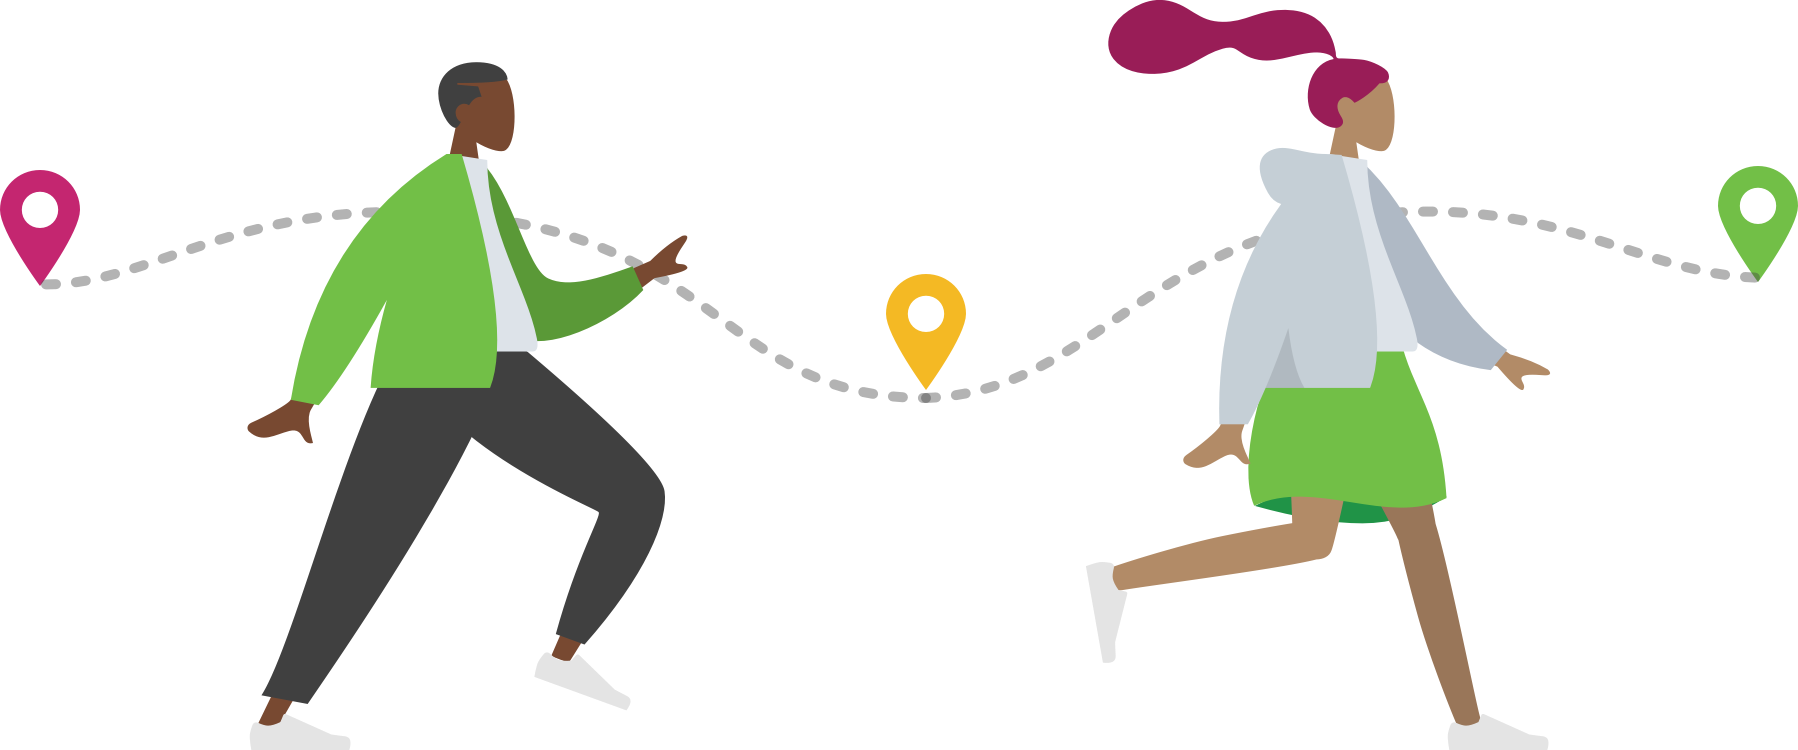 Students on a path illustration